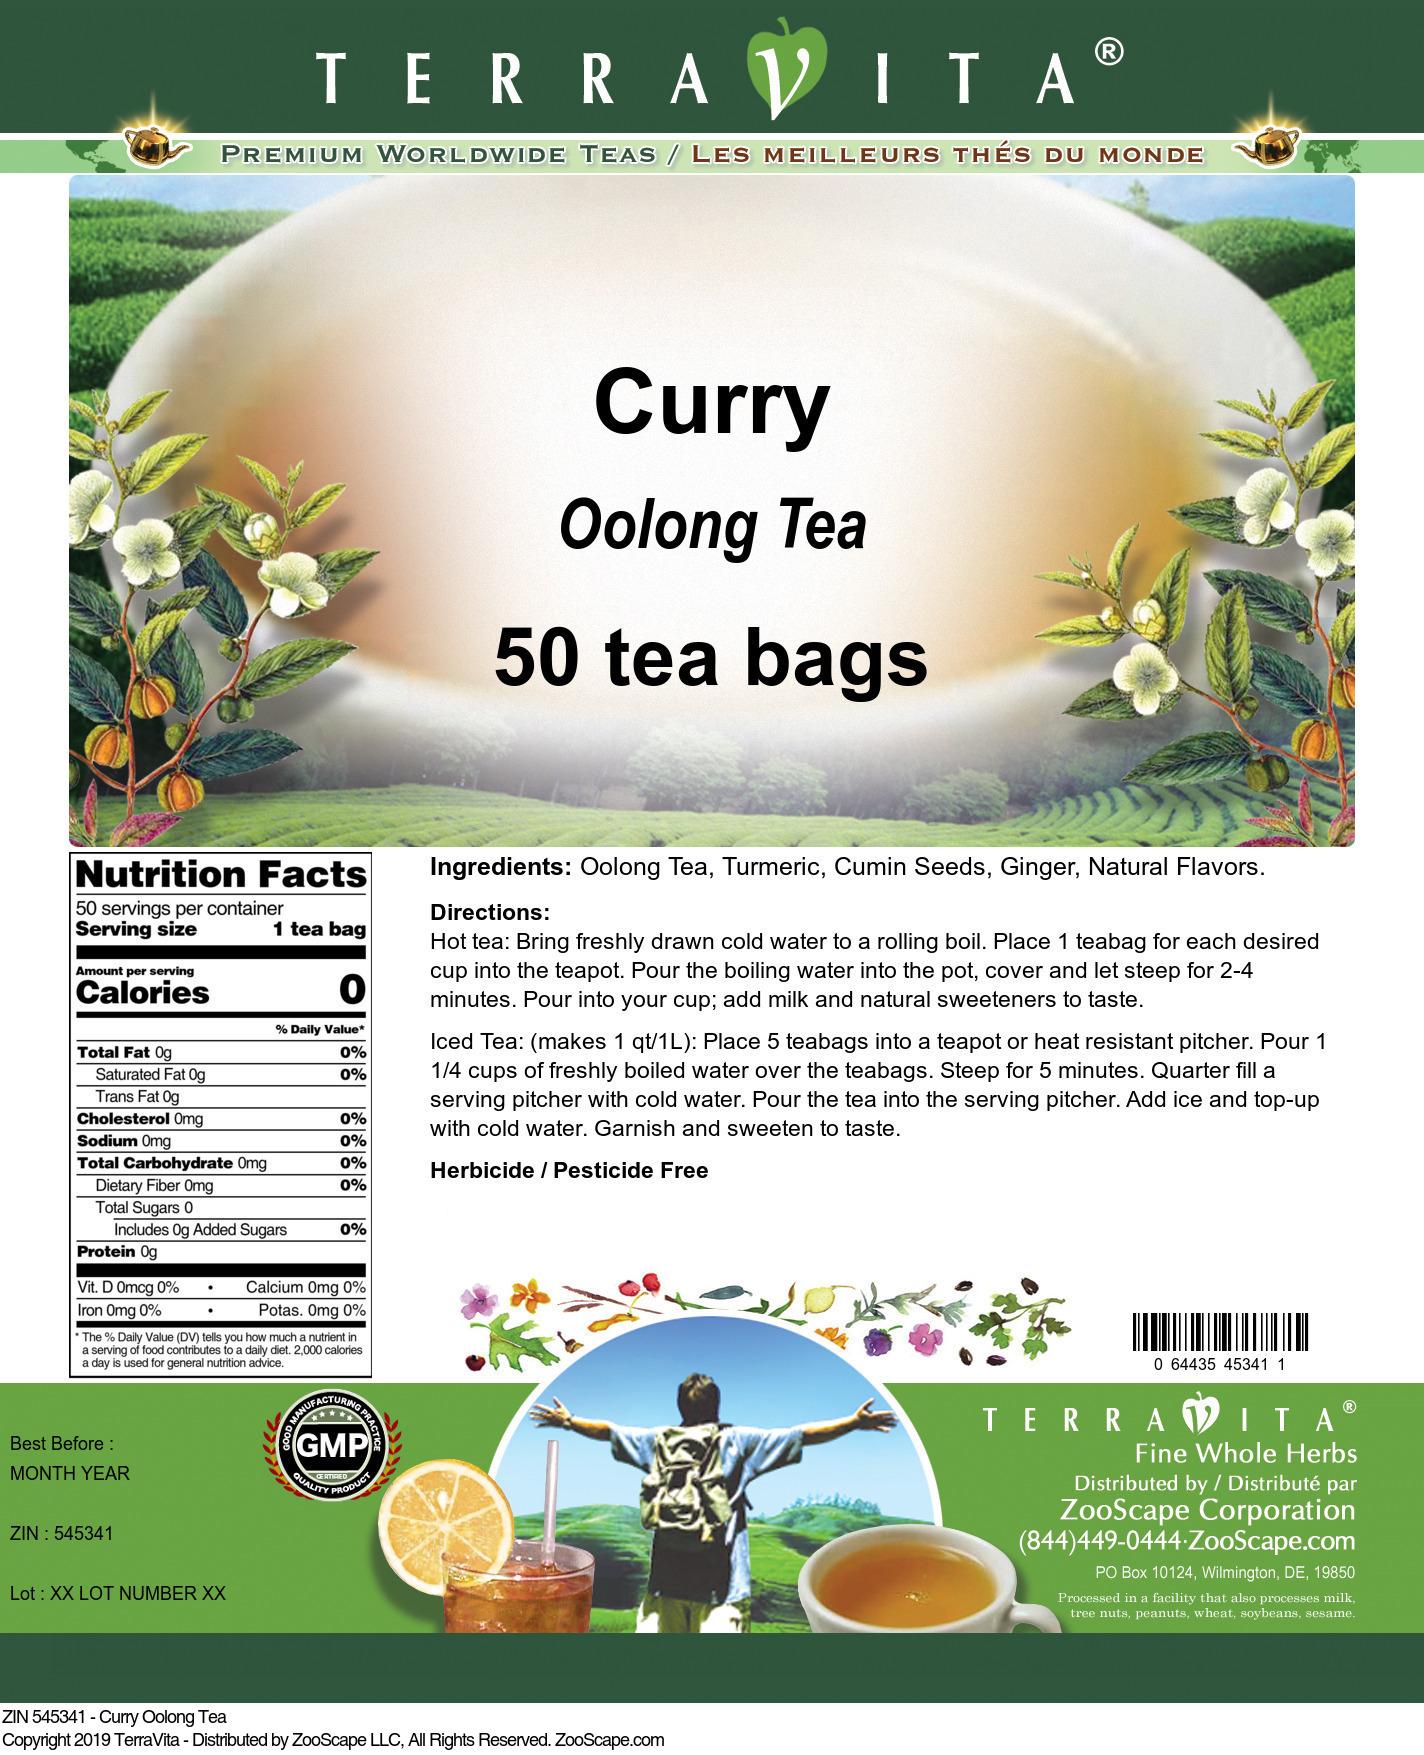 Curry Oolong Tea